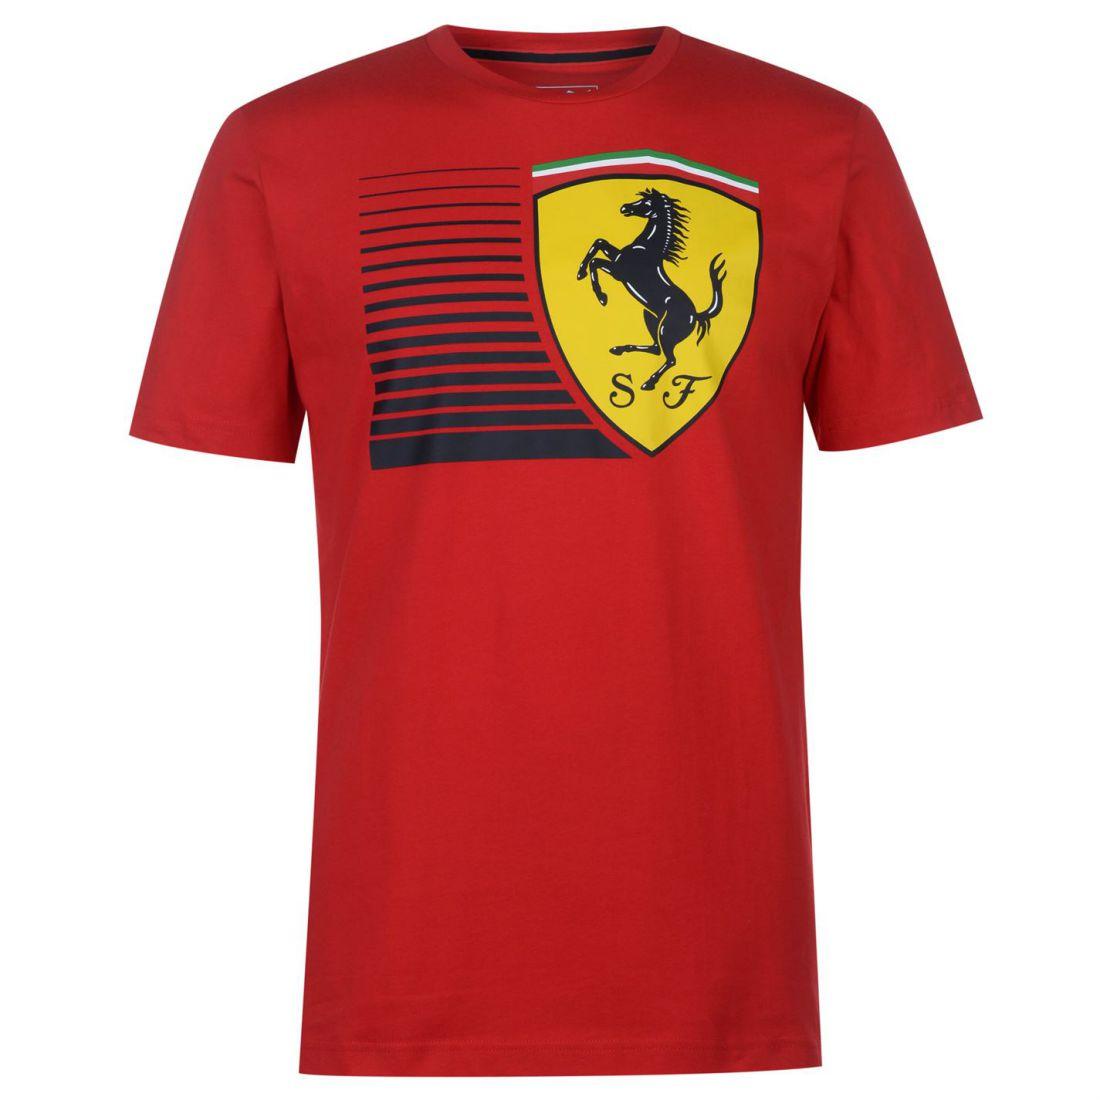 b2f651aac Puma Mens Scuderia Ferrari Big Shield T Shirt Crew Neck Tee Top Short Sleeve